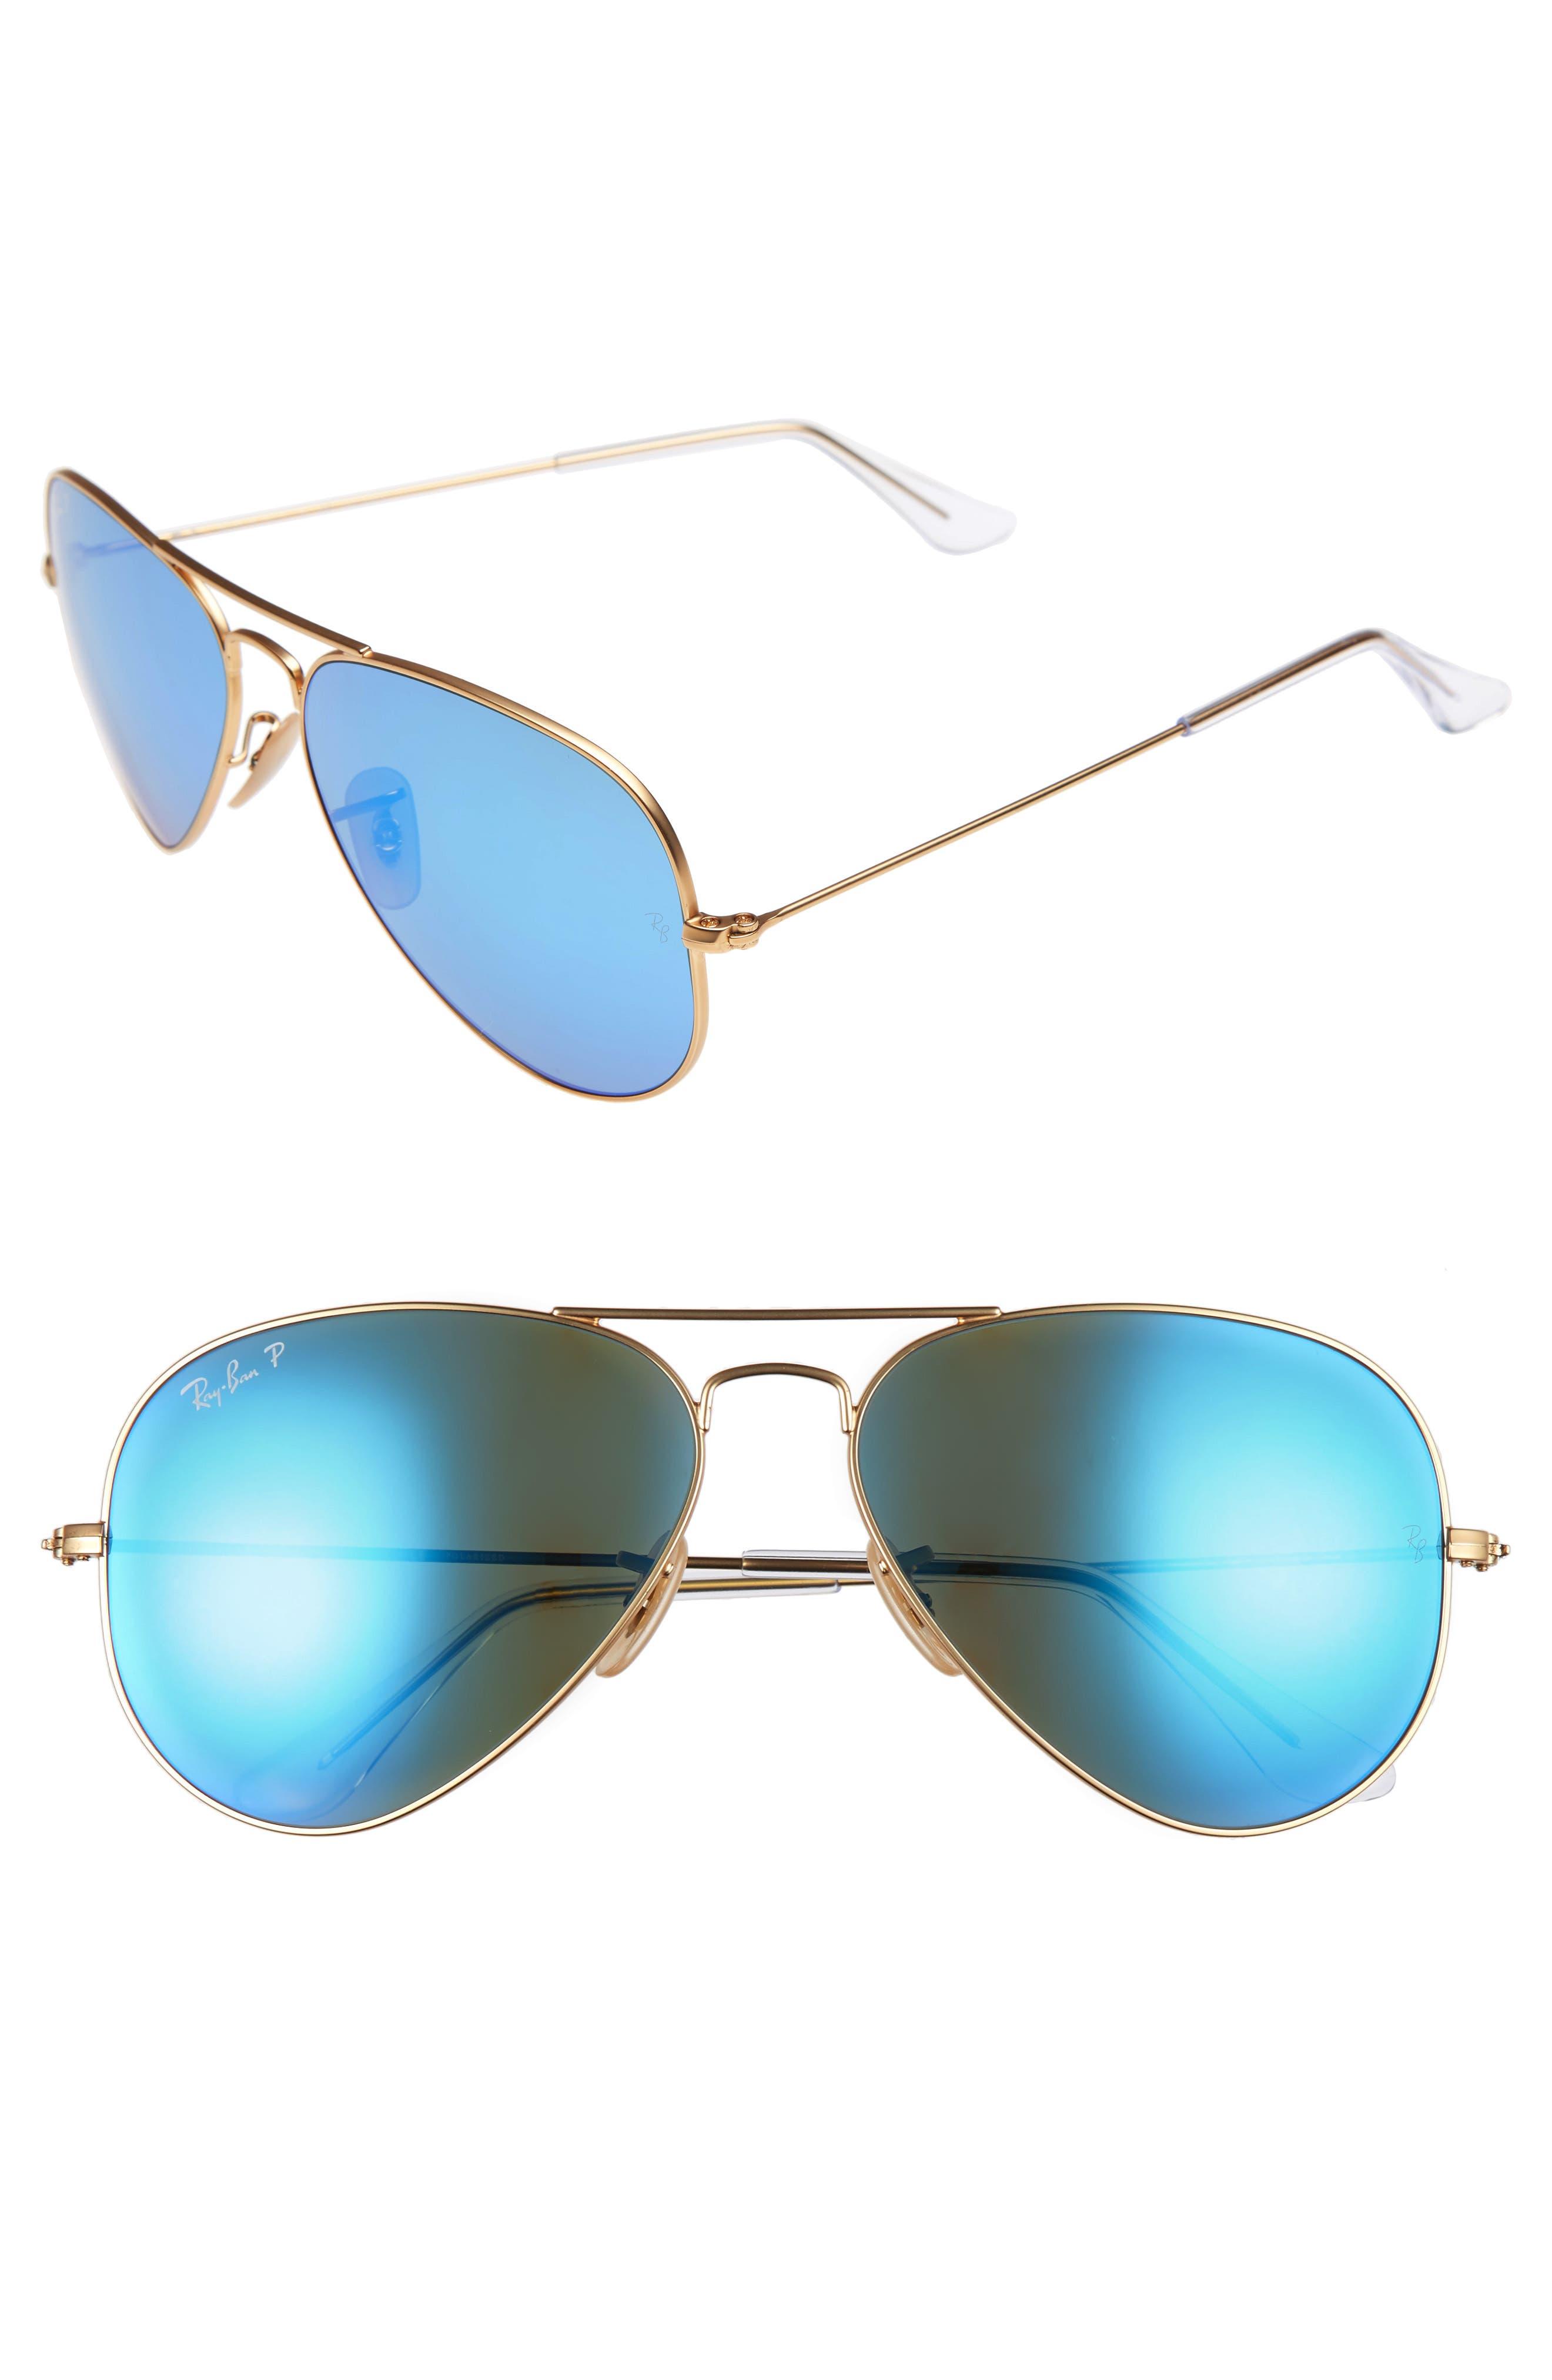 58mm Polarized Aviator Sunglasses,                             Alternate thumbnail 2, color,                             MATTE GOLD/ BLUE MIRROR